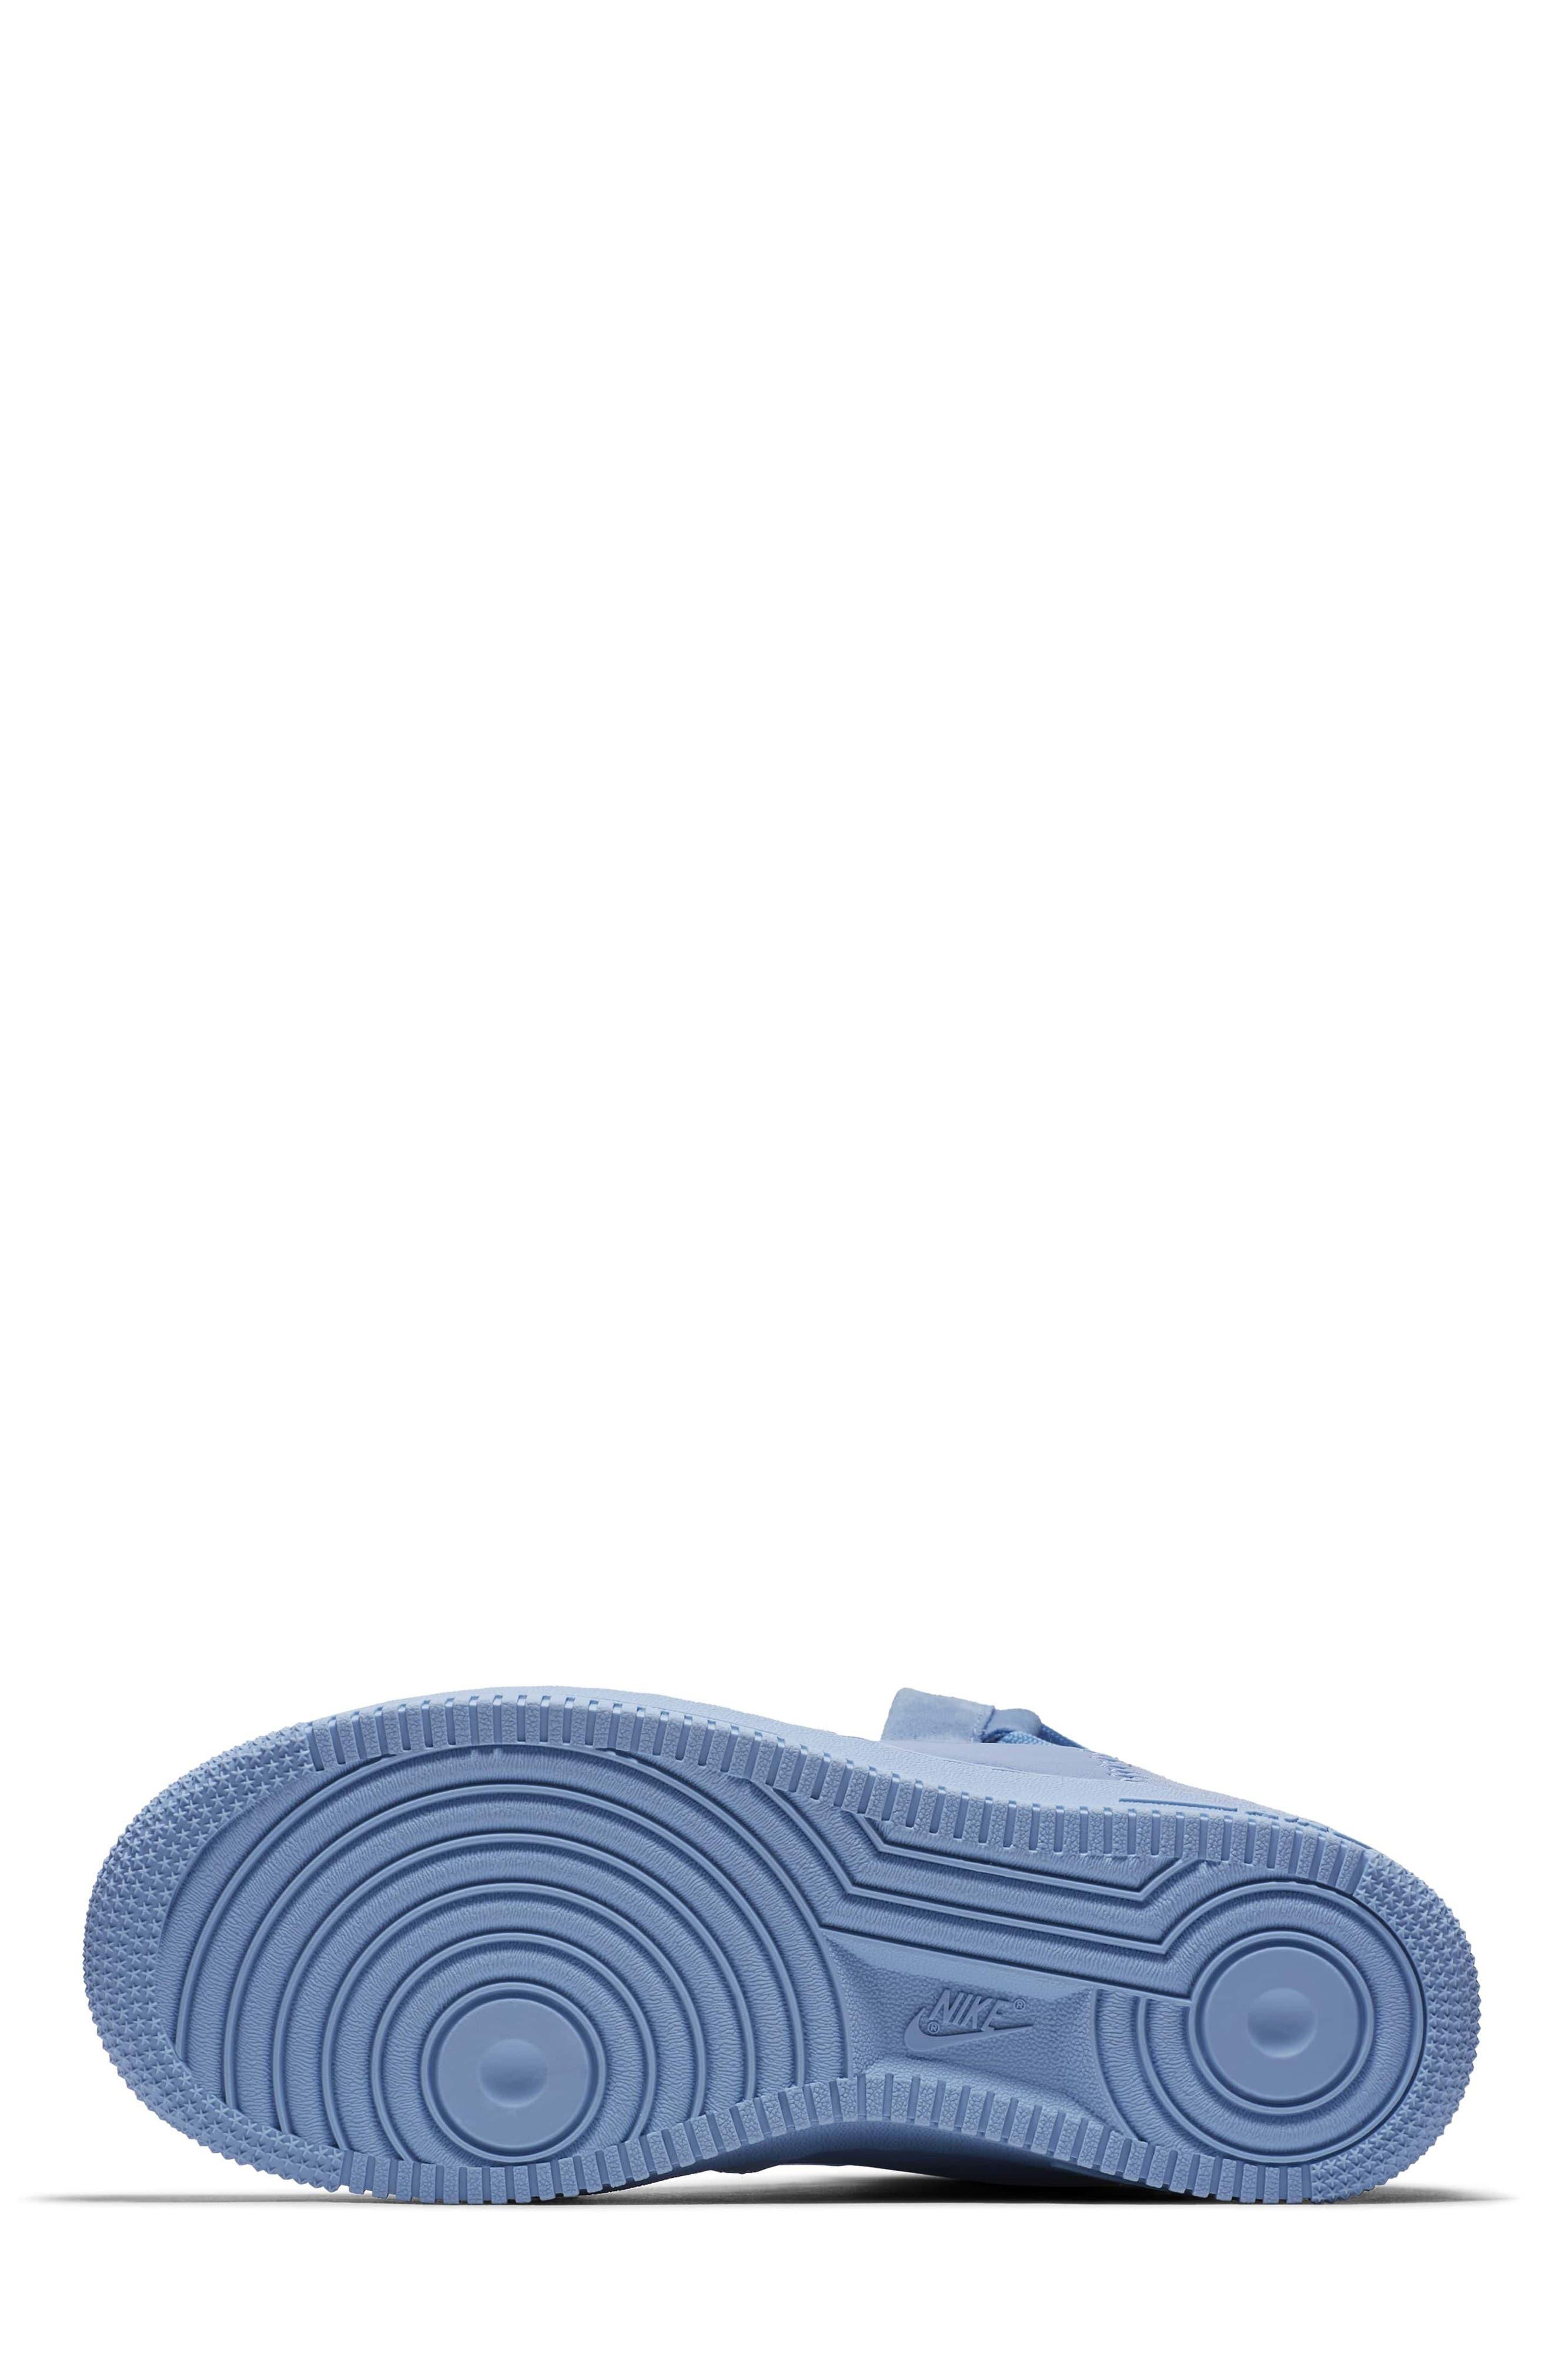 Air Force 1 Rebel XX High Top Sneaker,                             Alternate thumbnail 6, color,                             Light Blue